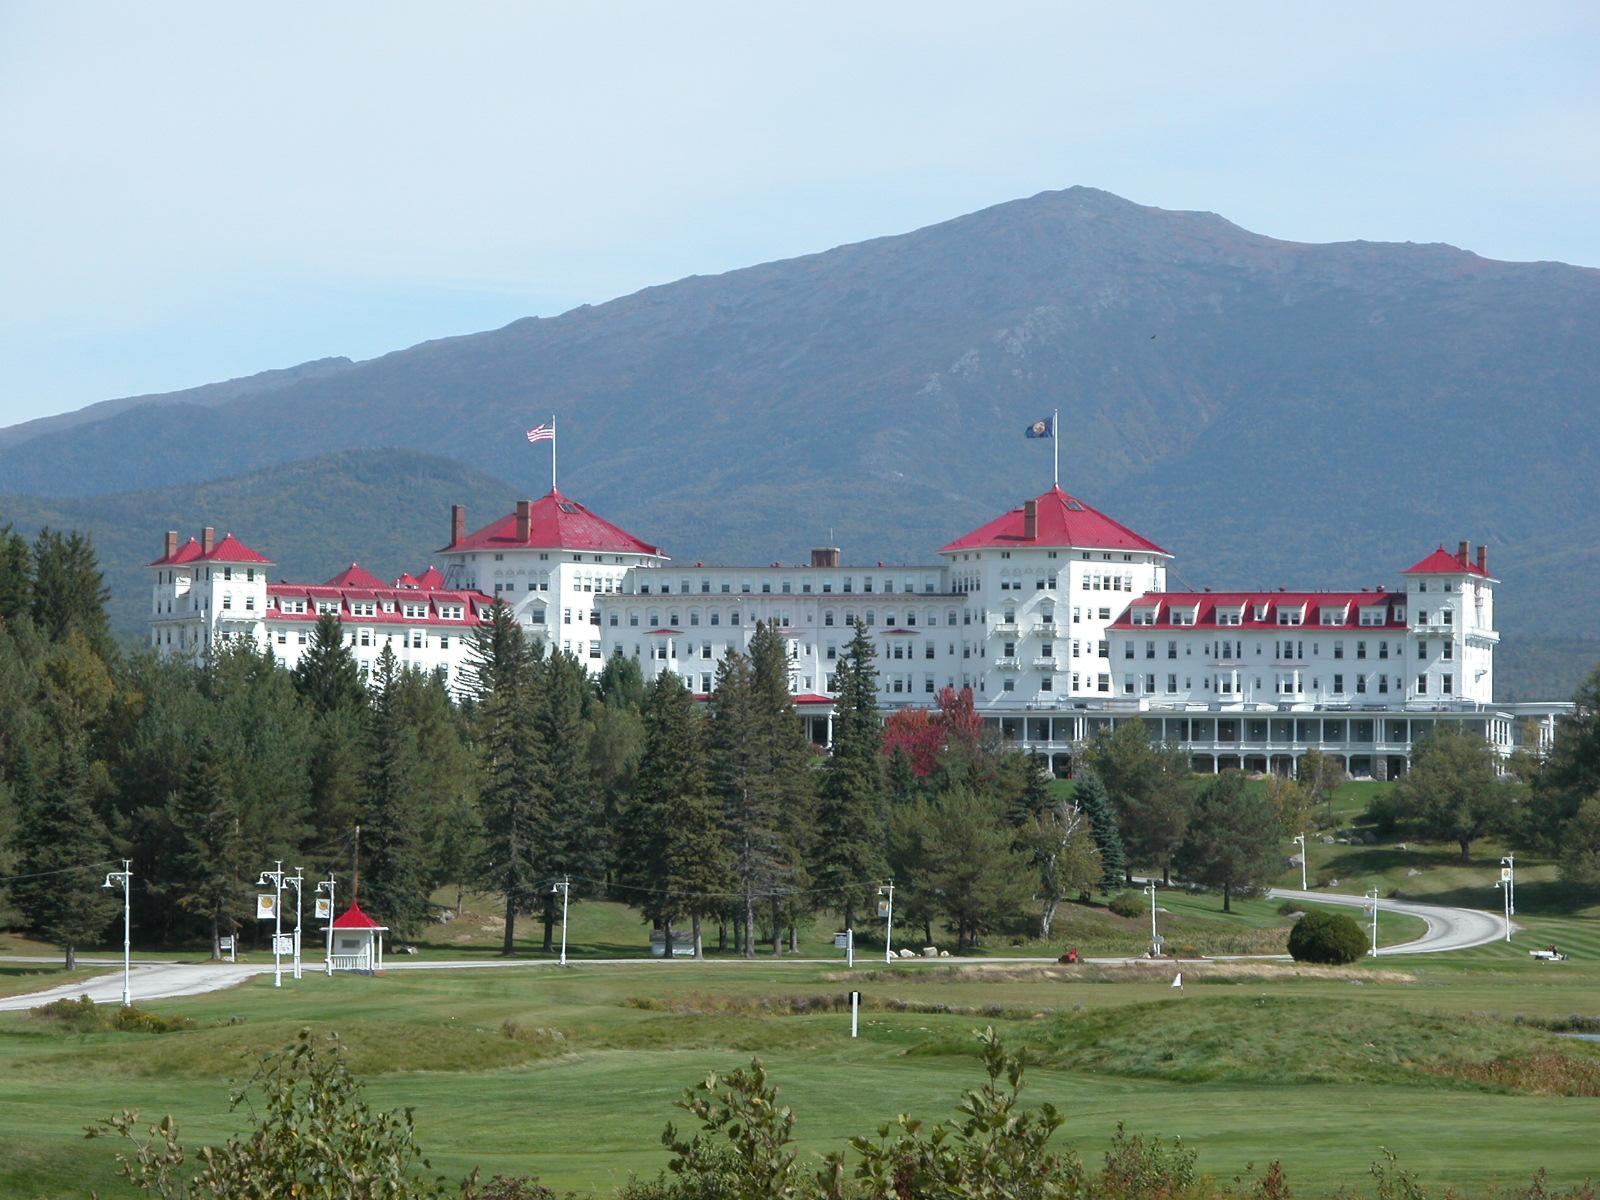 File:Mount Washington Hotel 2003.JPG